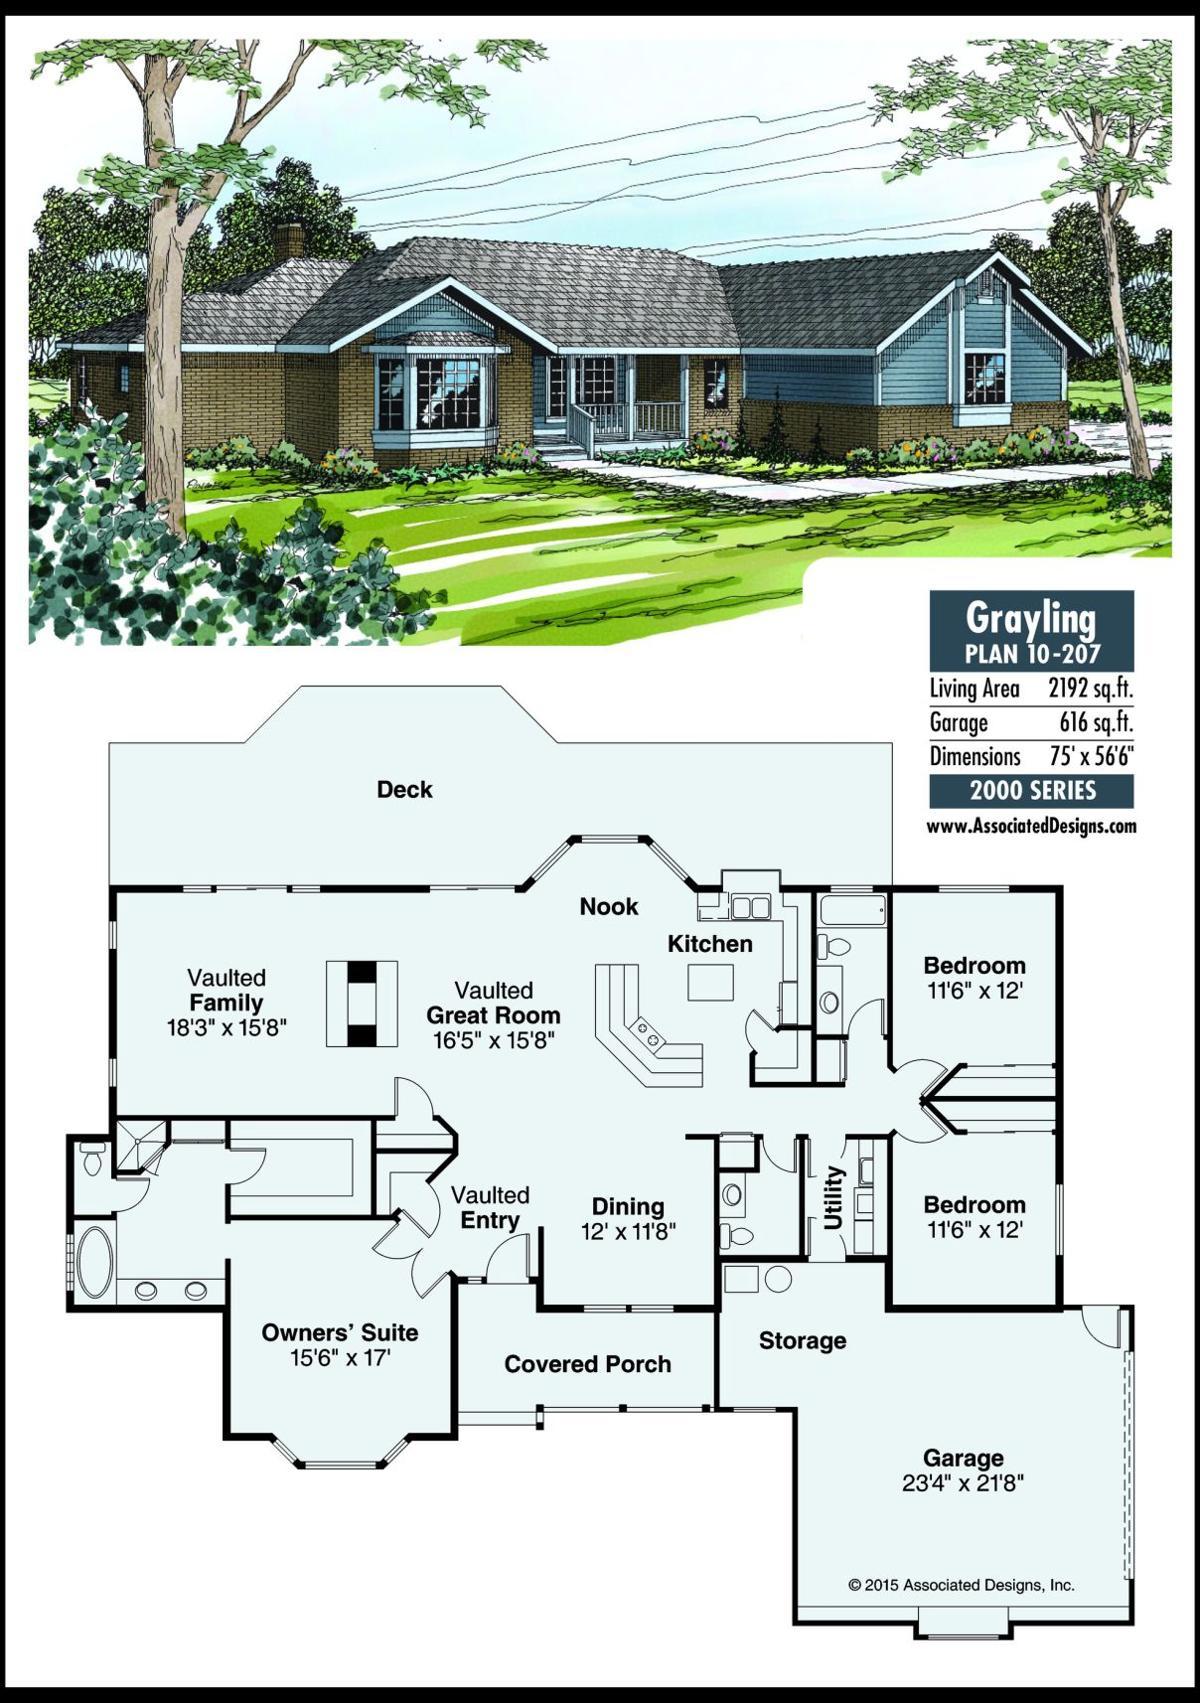 This week's house plan Grayling 10-207